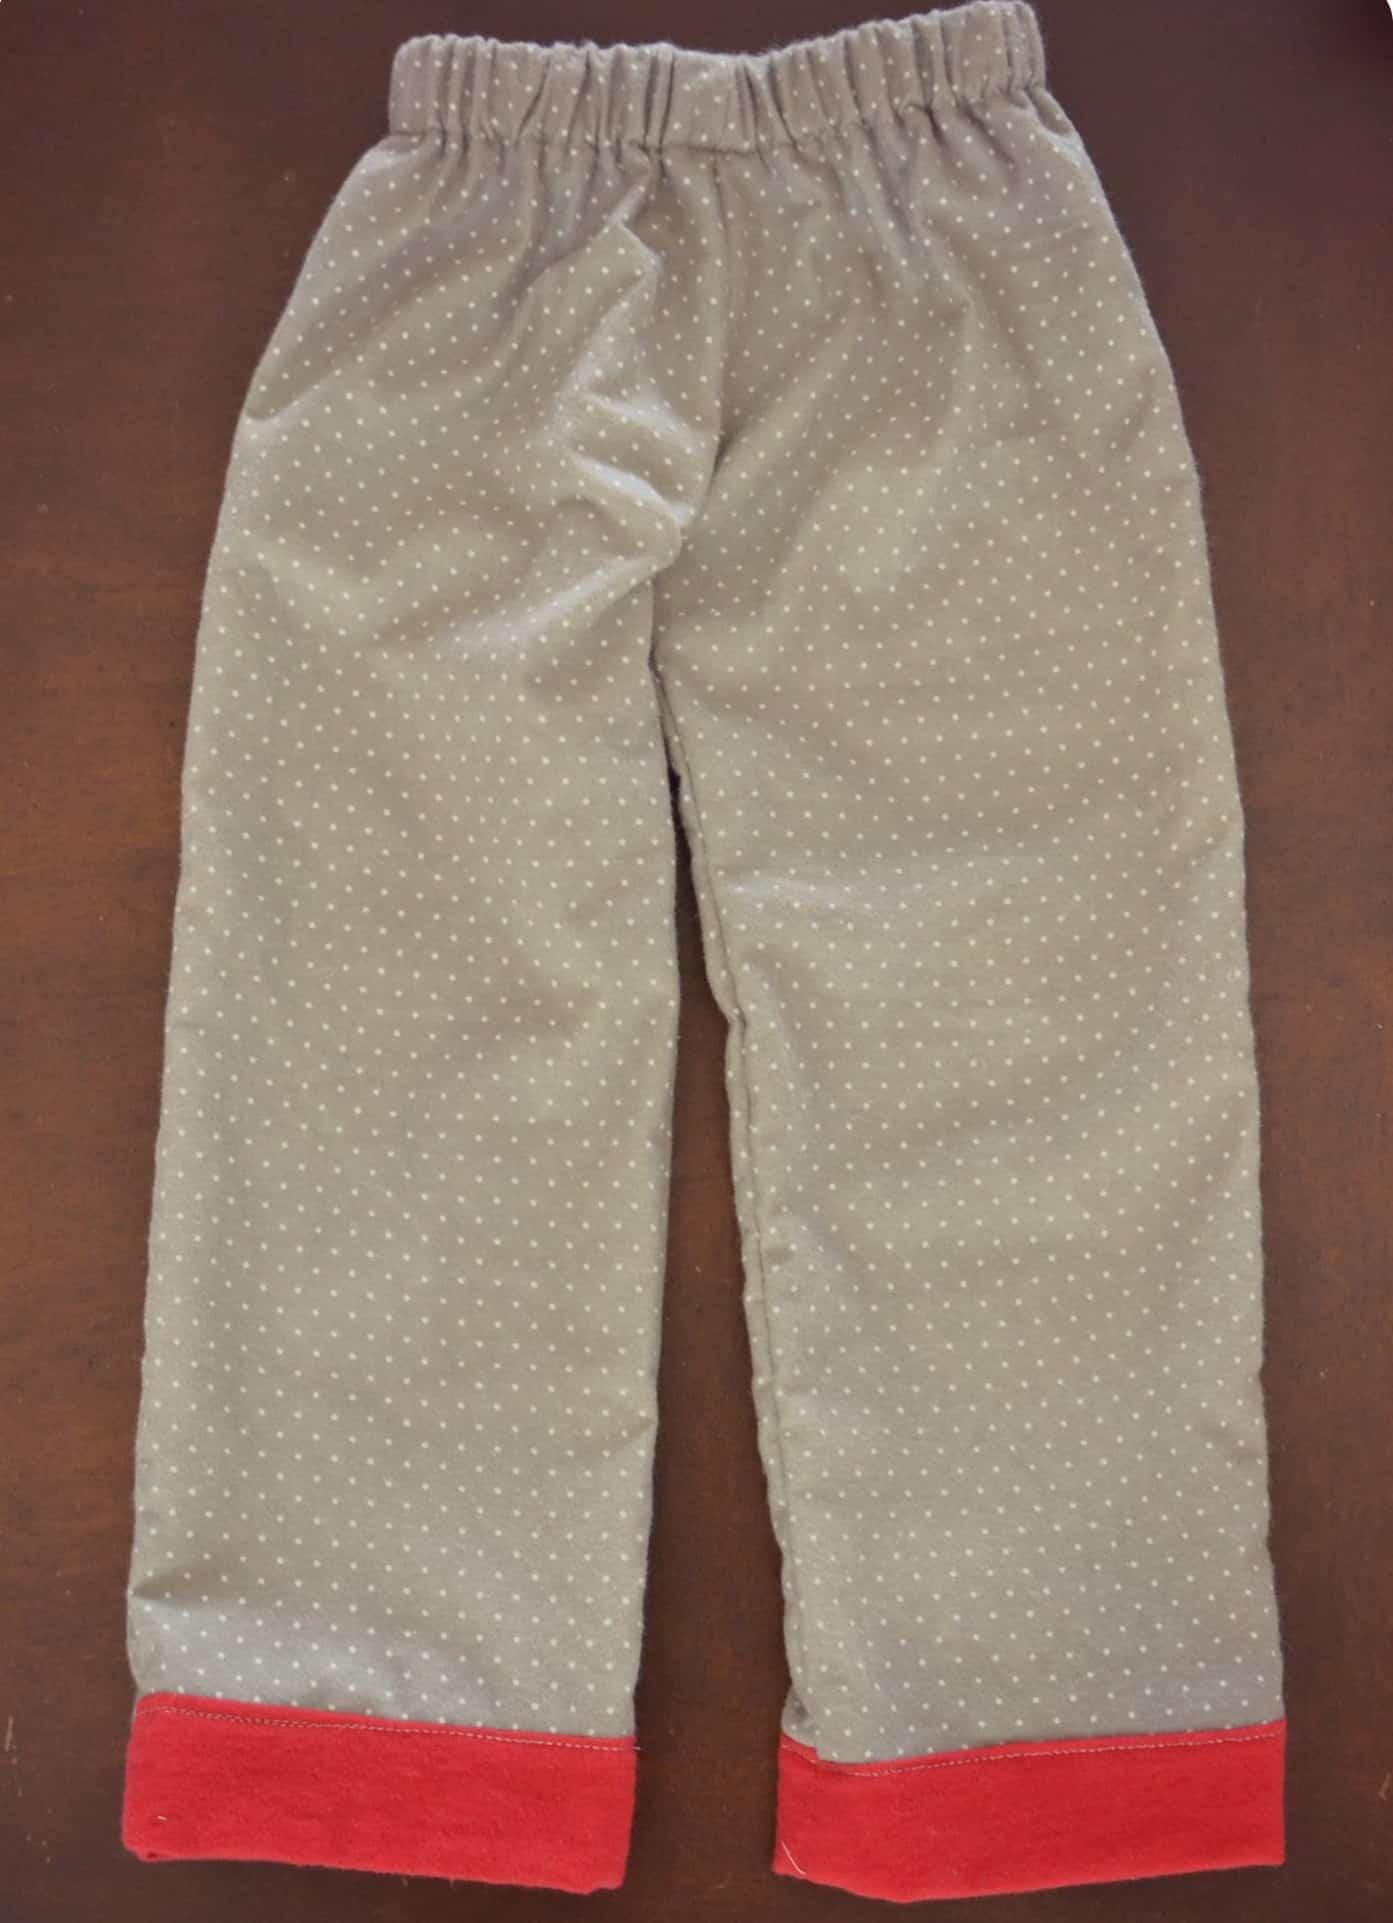 Dotted pajama pants